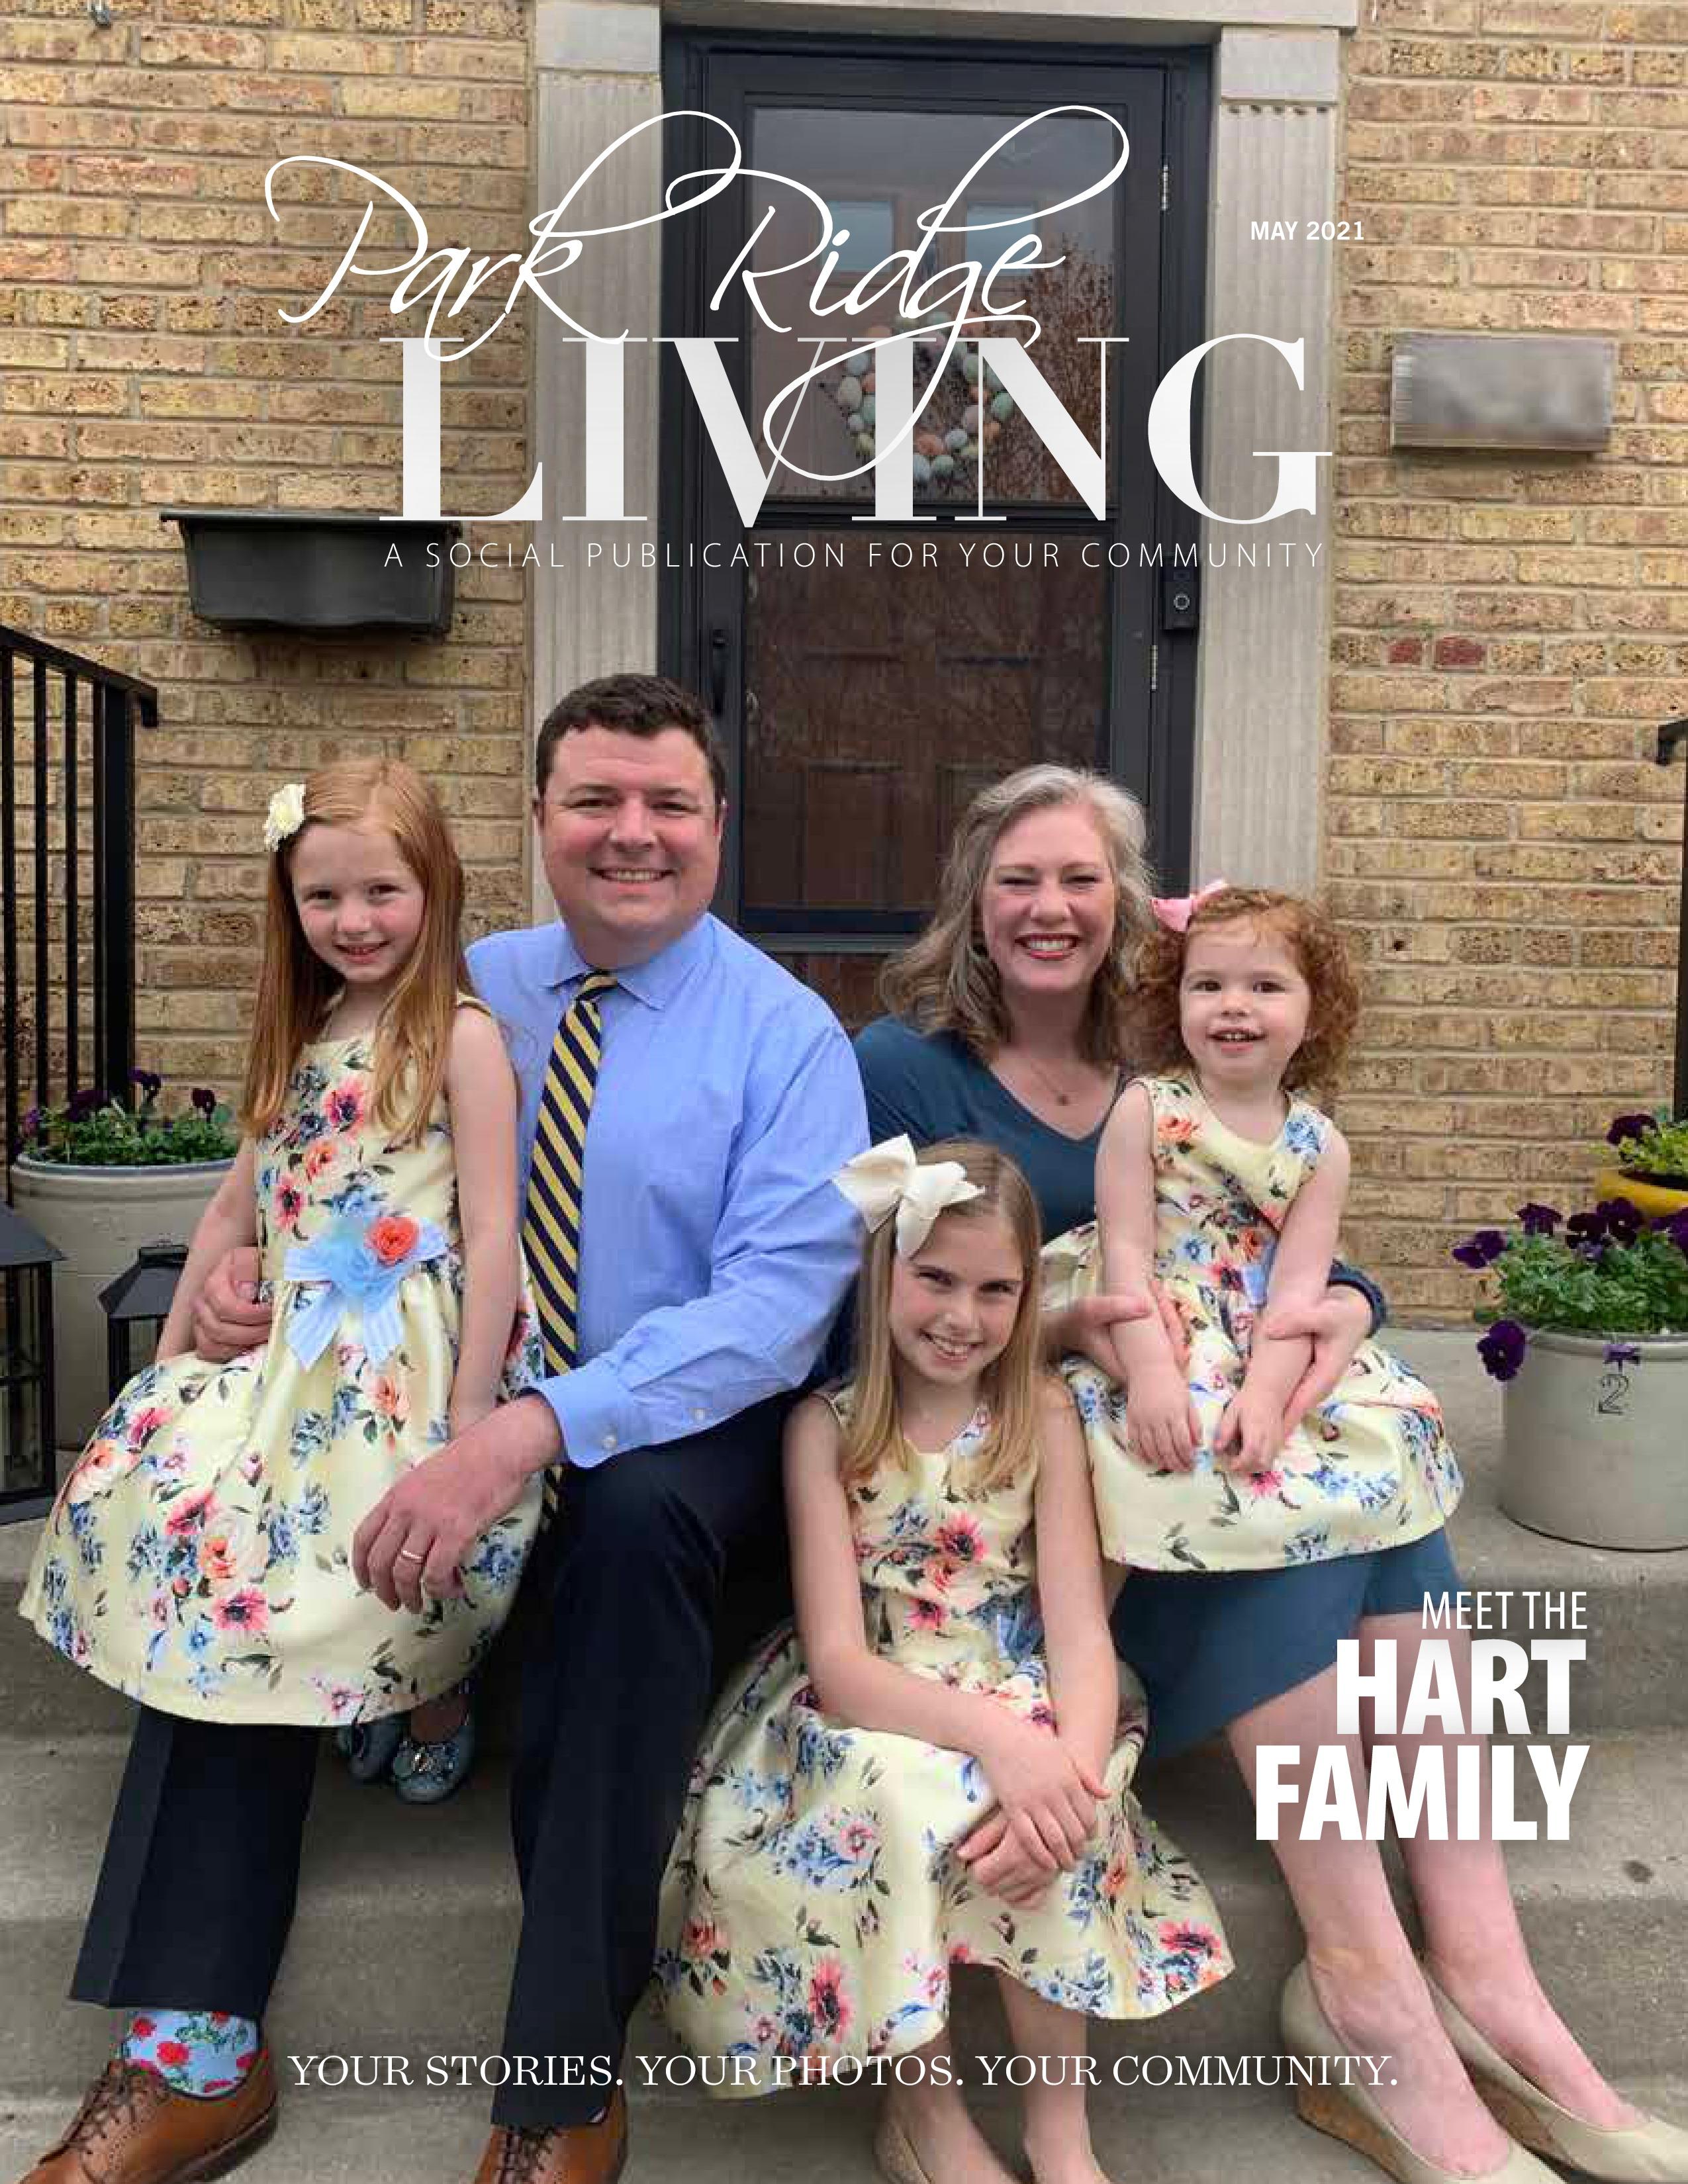 Park Ridge Living 2021-05-01